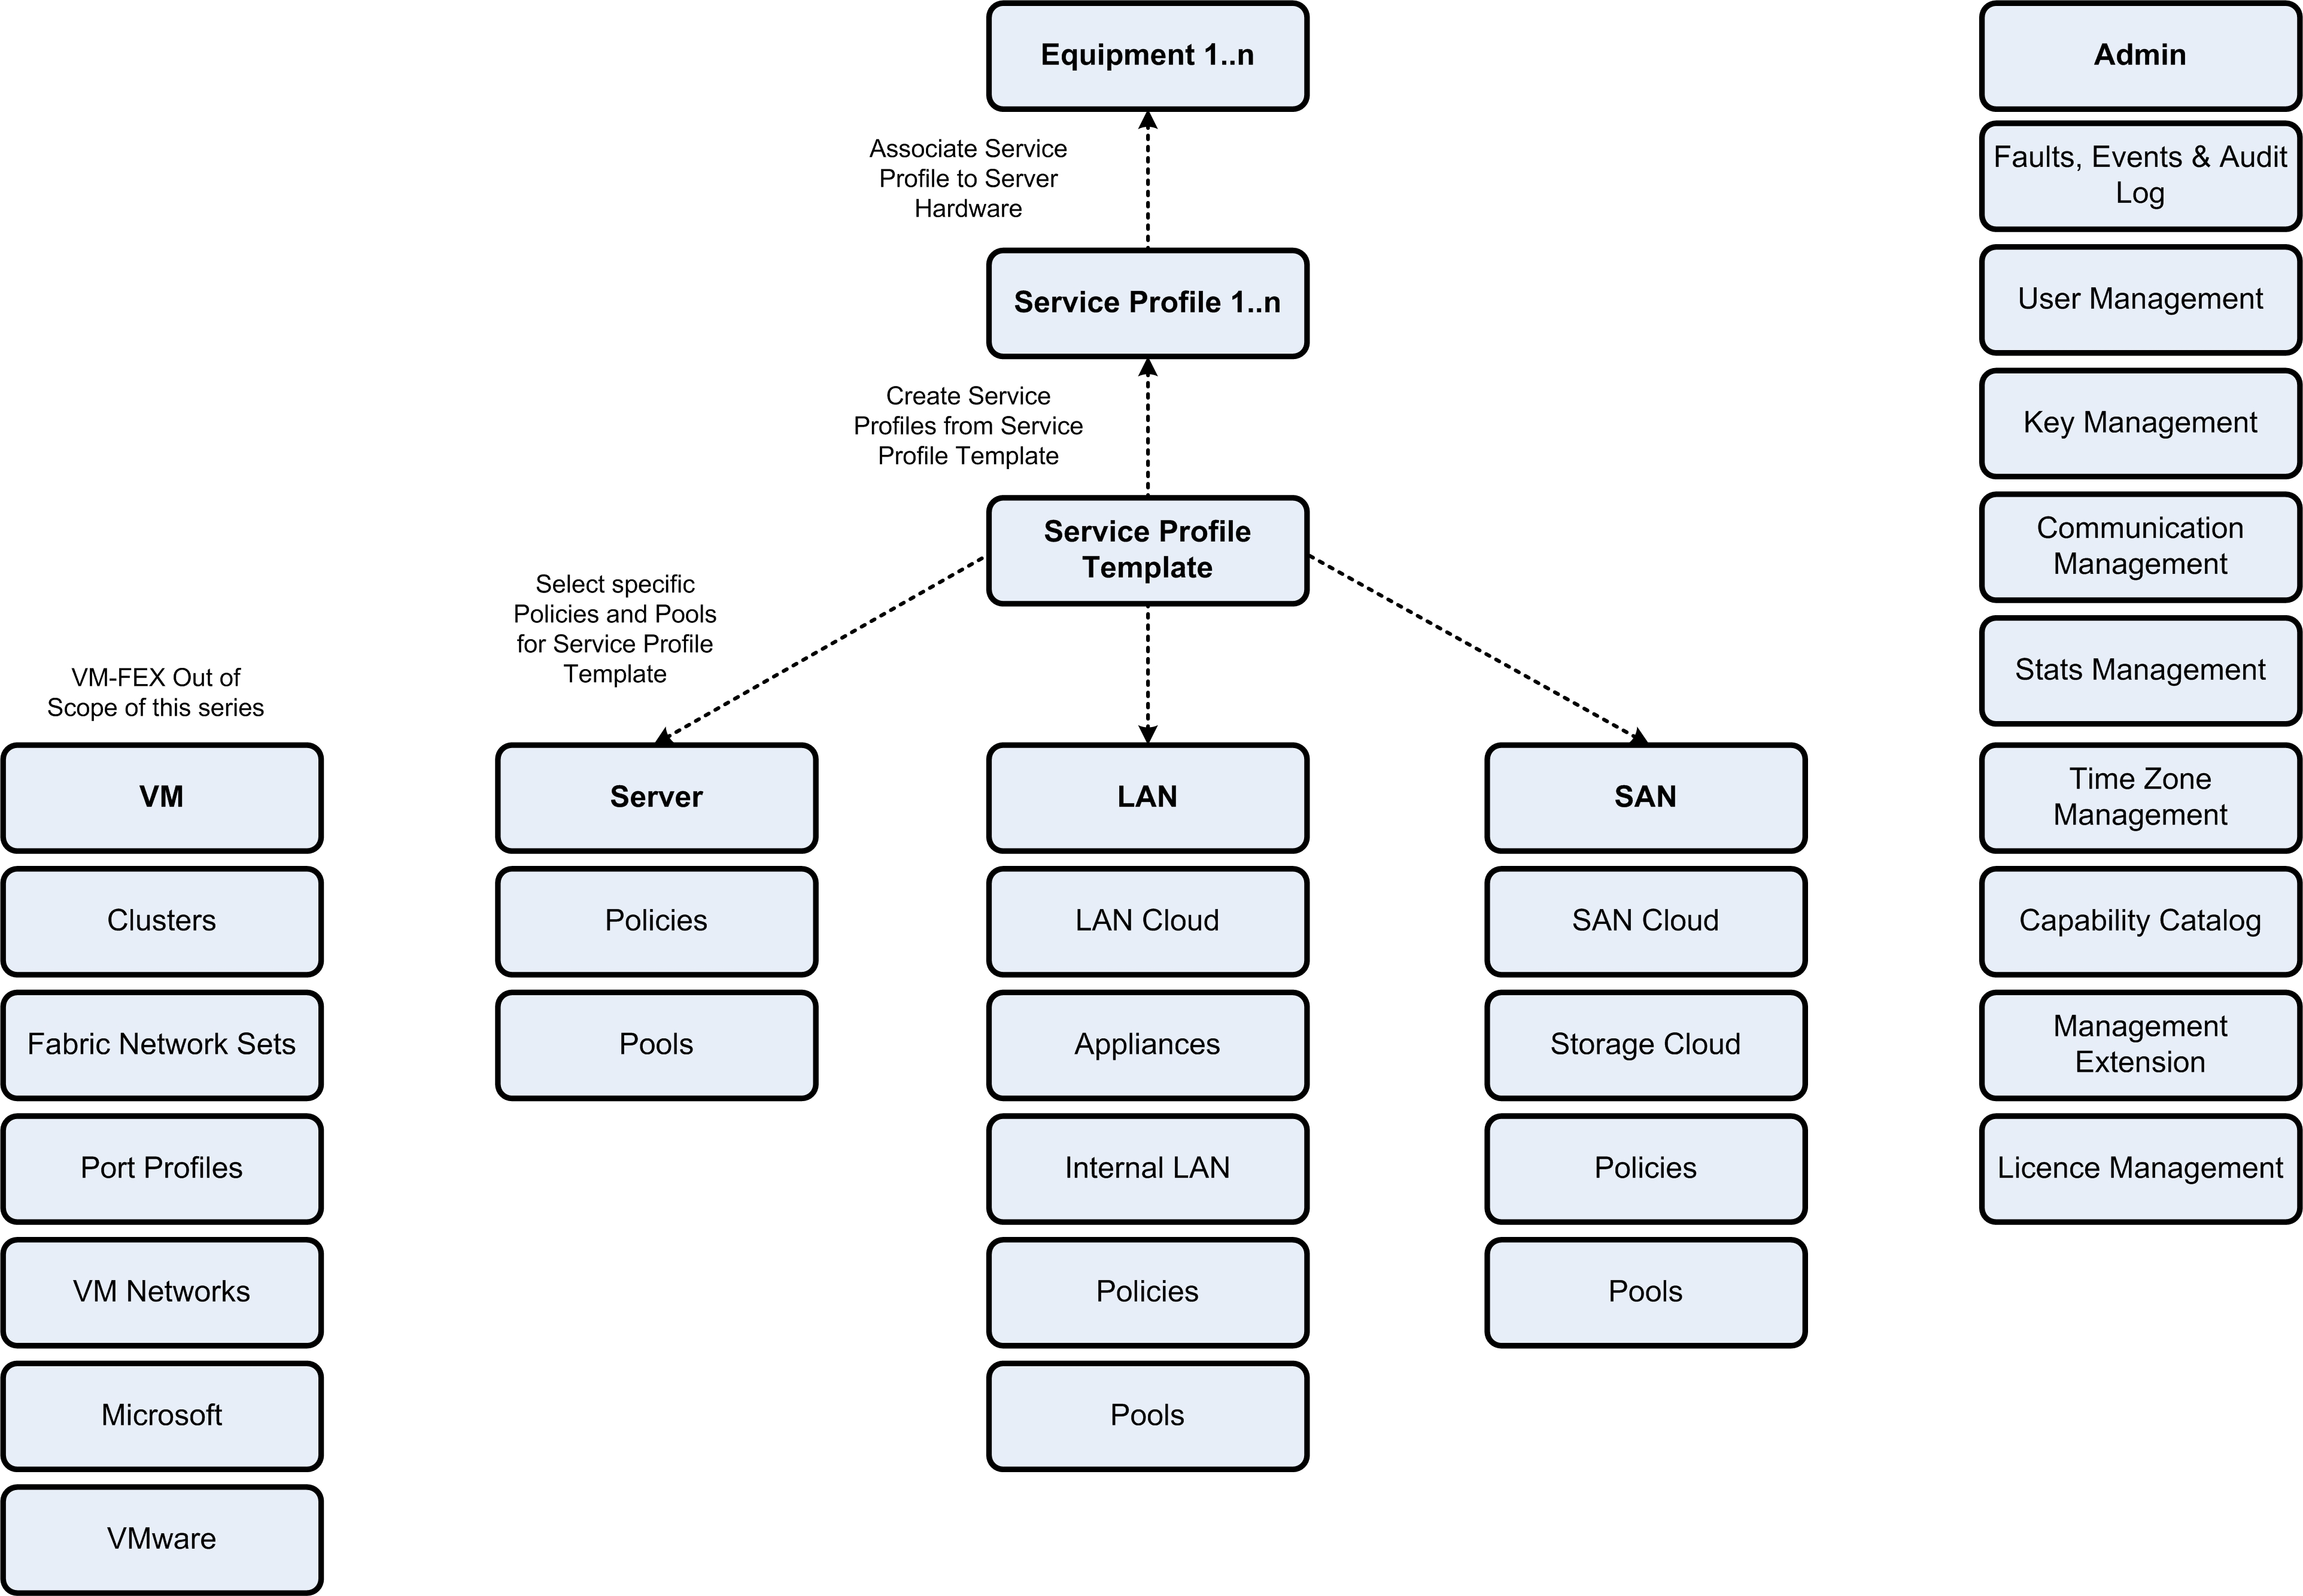 cisco ucs diagram porsche cayenne 955 wiring configuration guide for vsphere  part 1